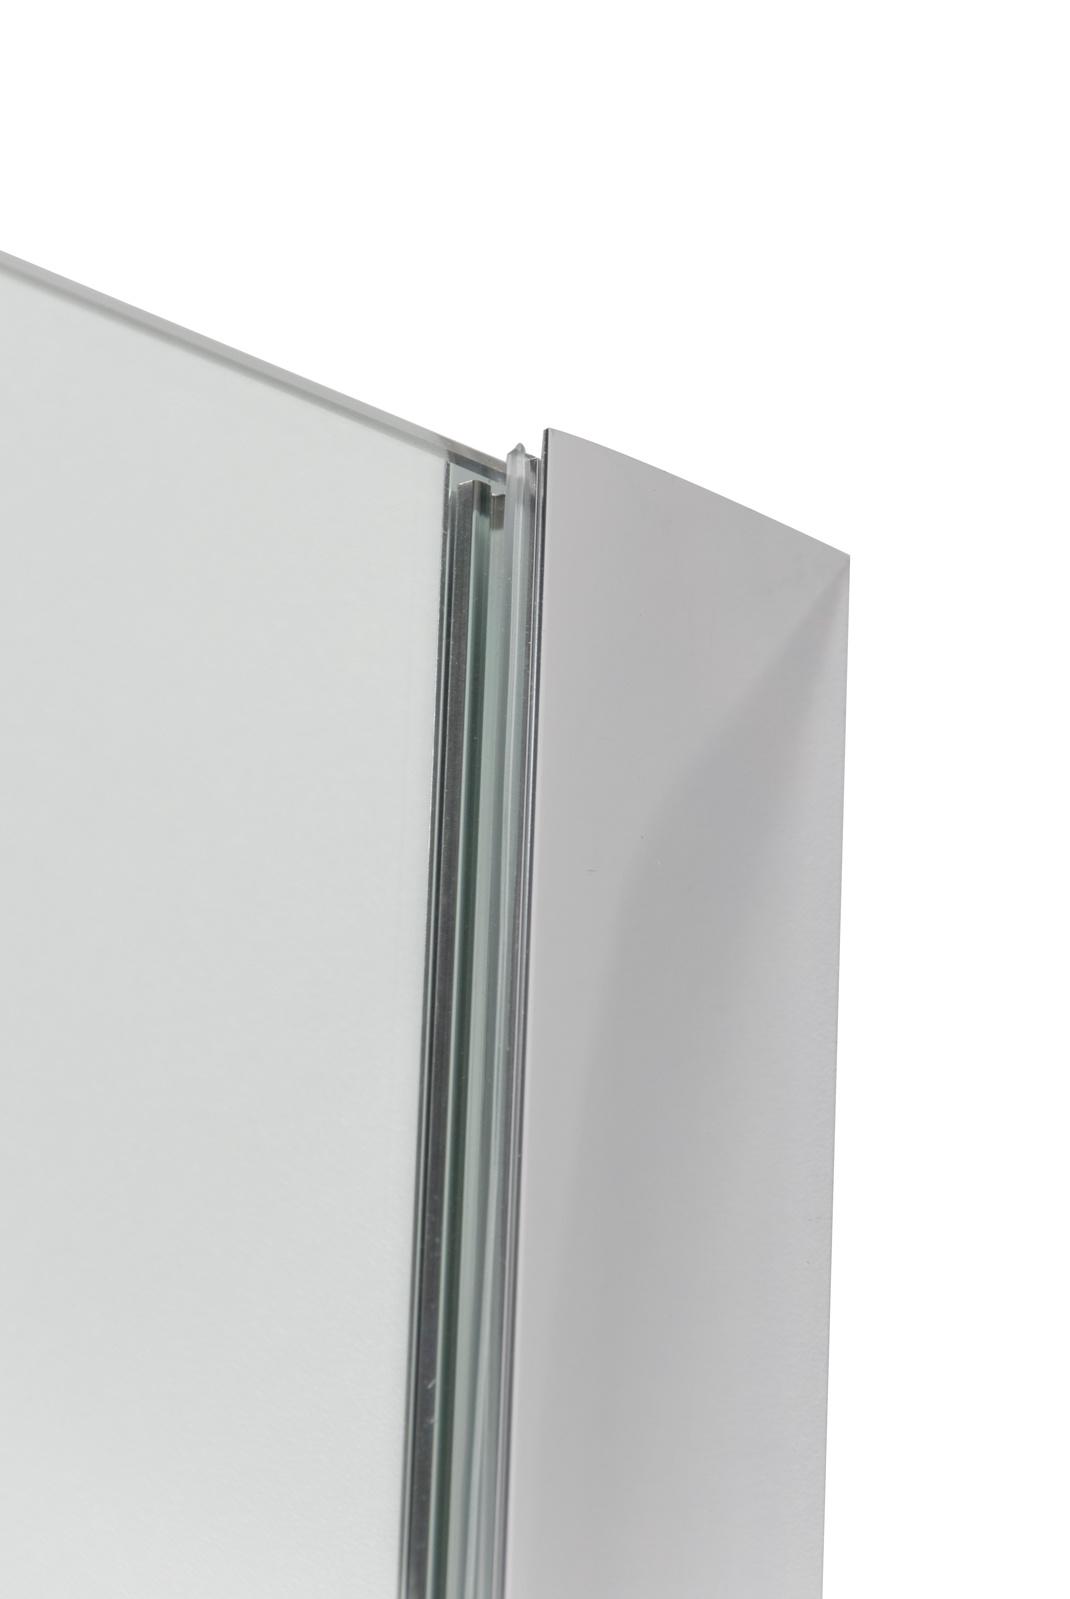 Inloopdouche Göteborg 110 x 200 cm